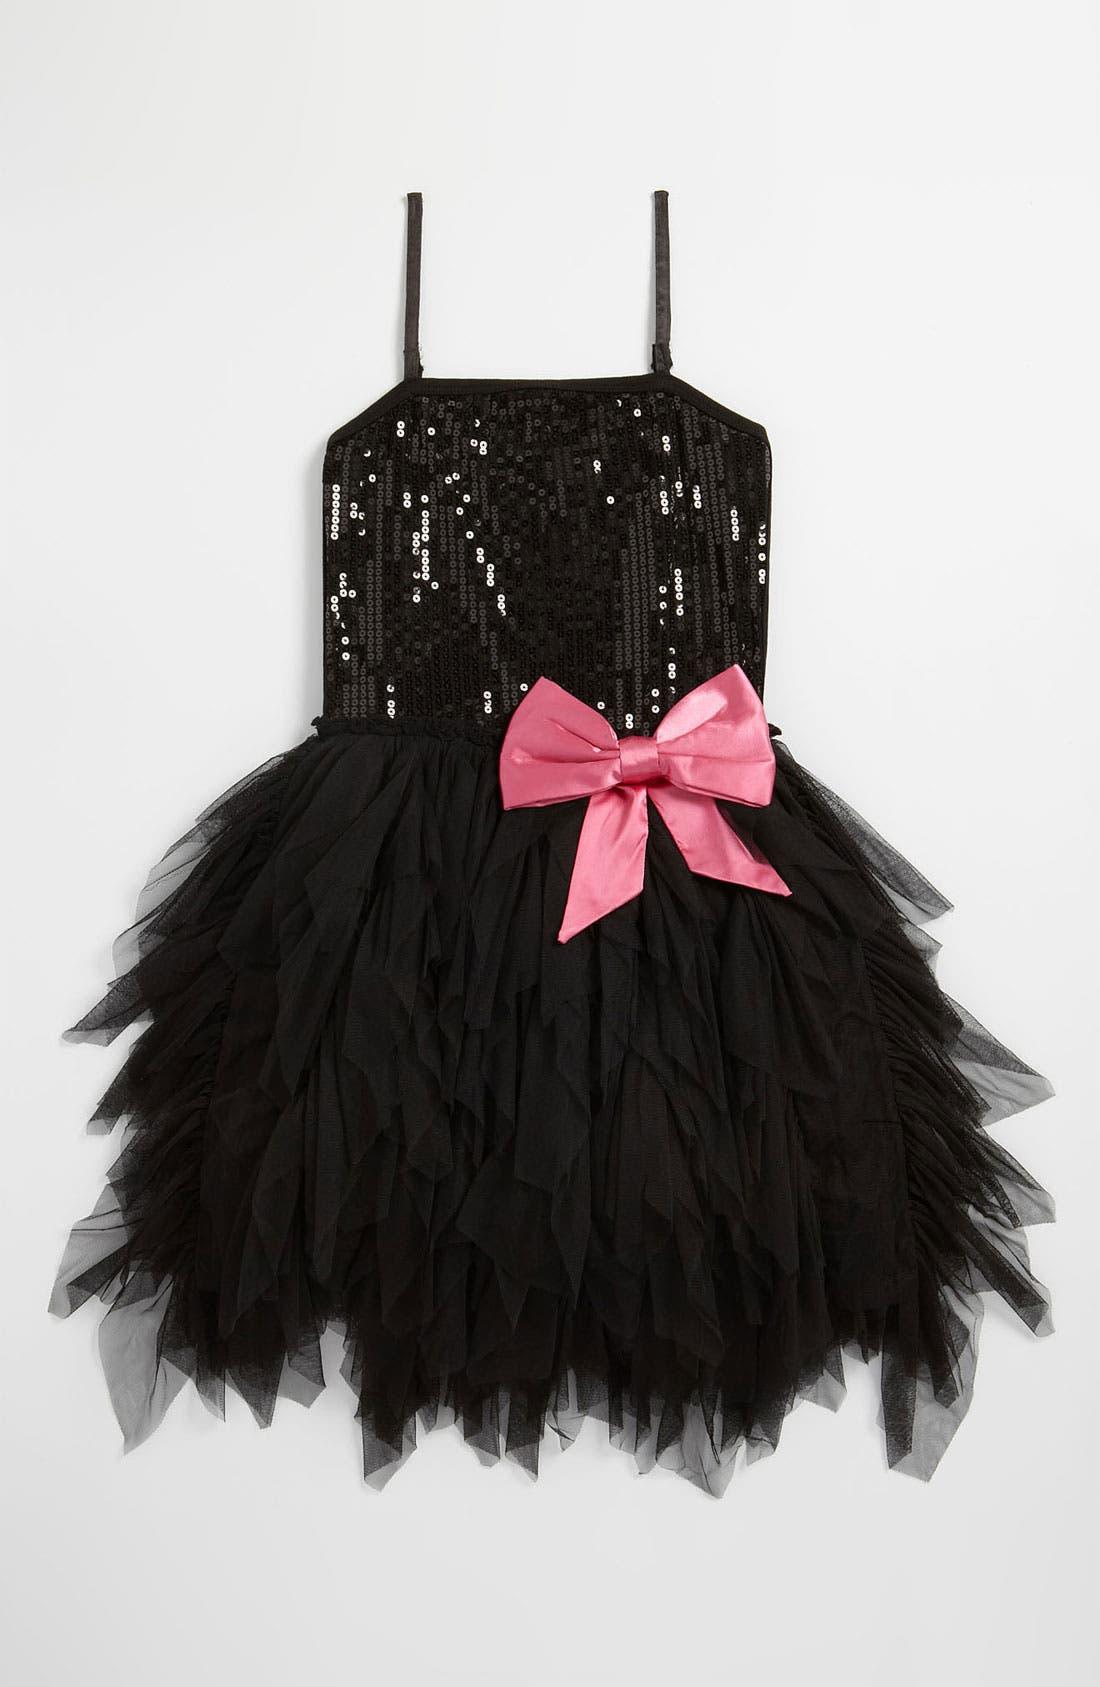 Alternate Image 1 Selected - Ooh! La, La! Couture 'Wow' Sequin Tutu Dress (Big Girls)